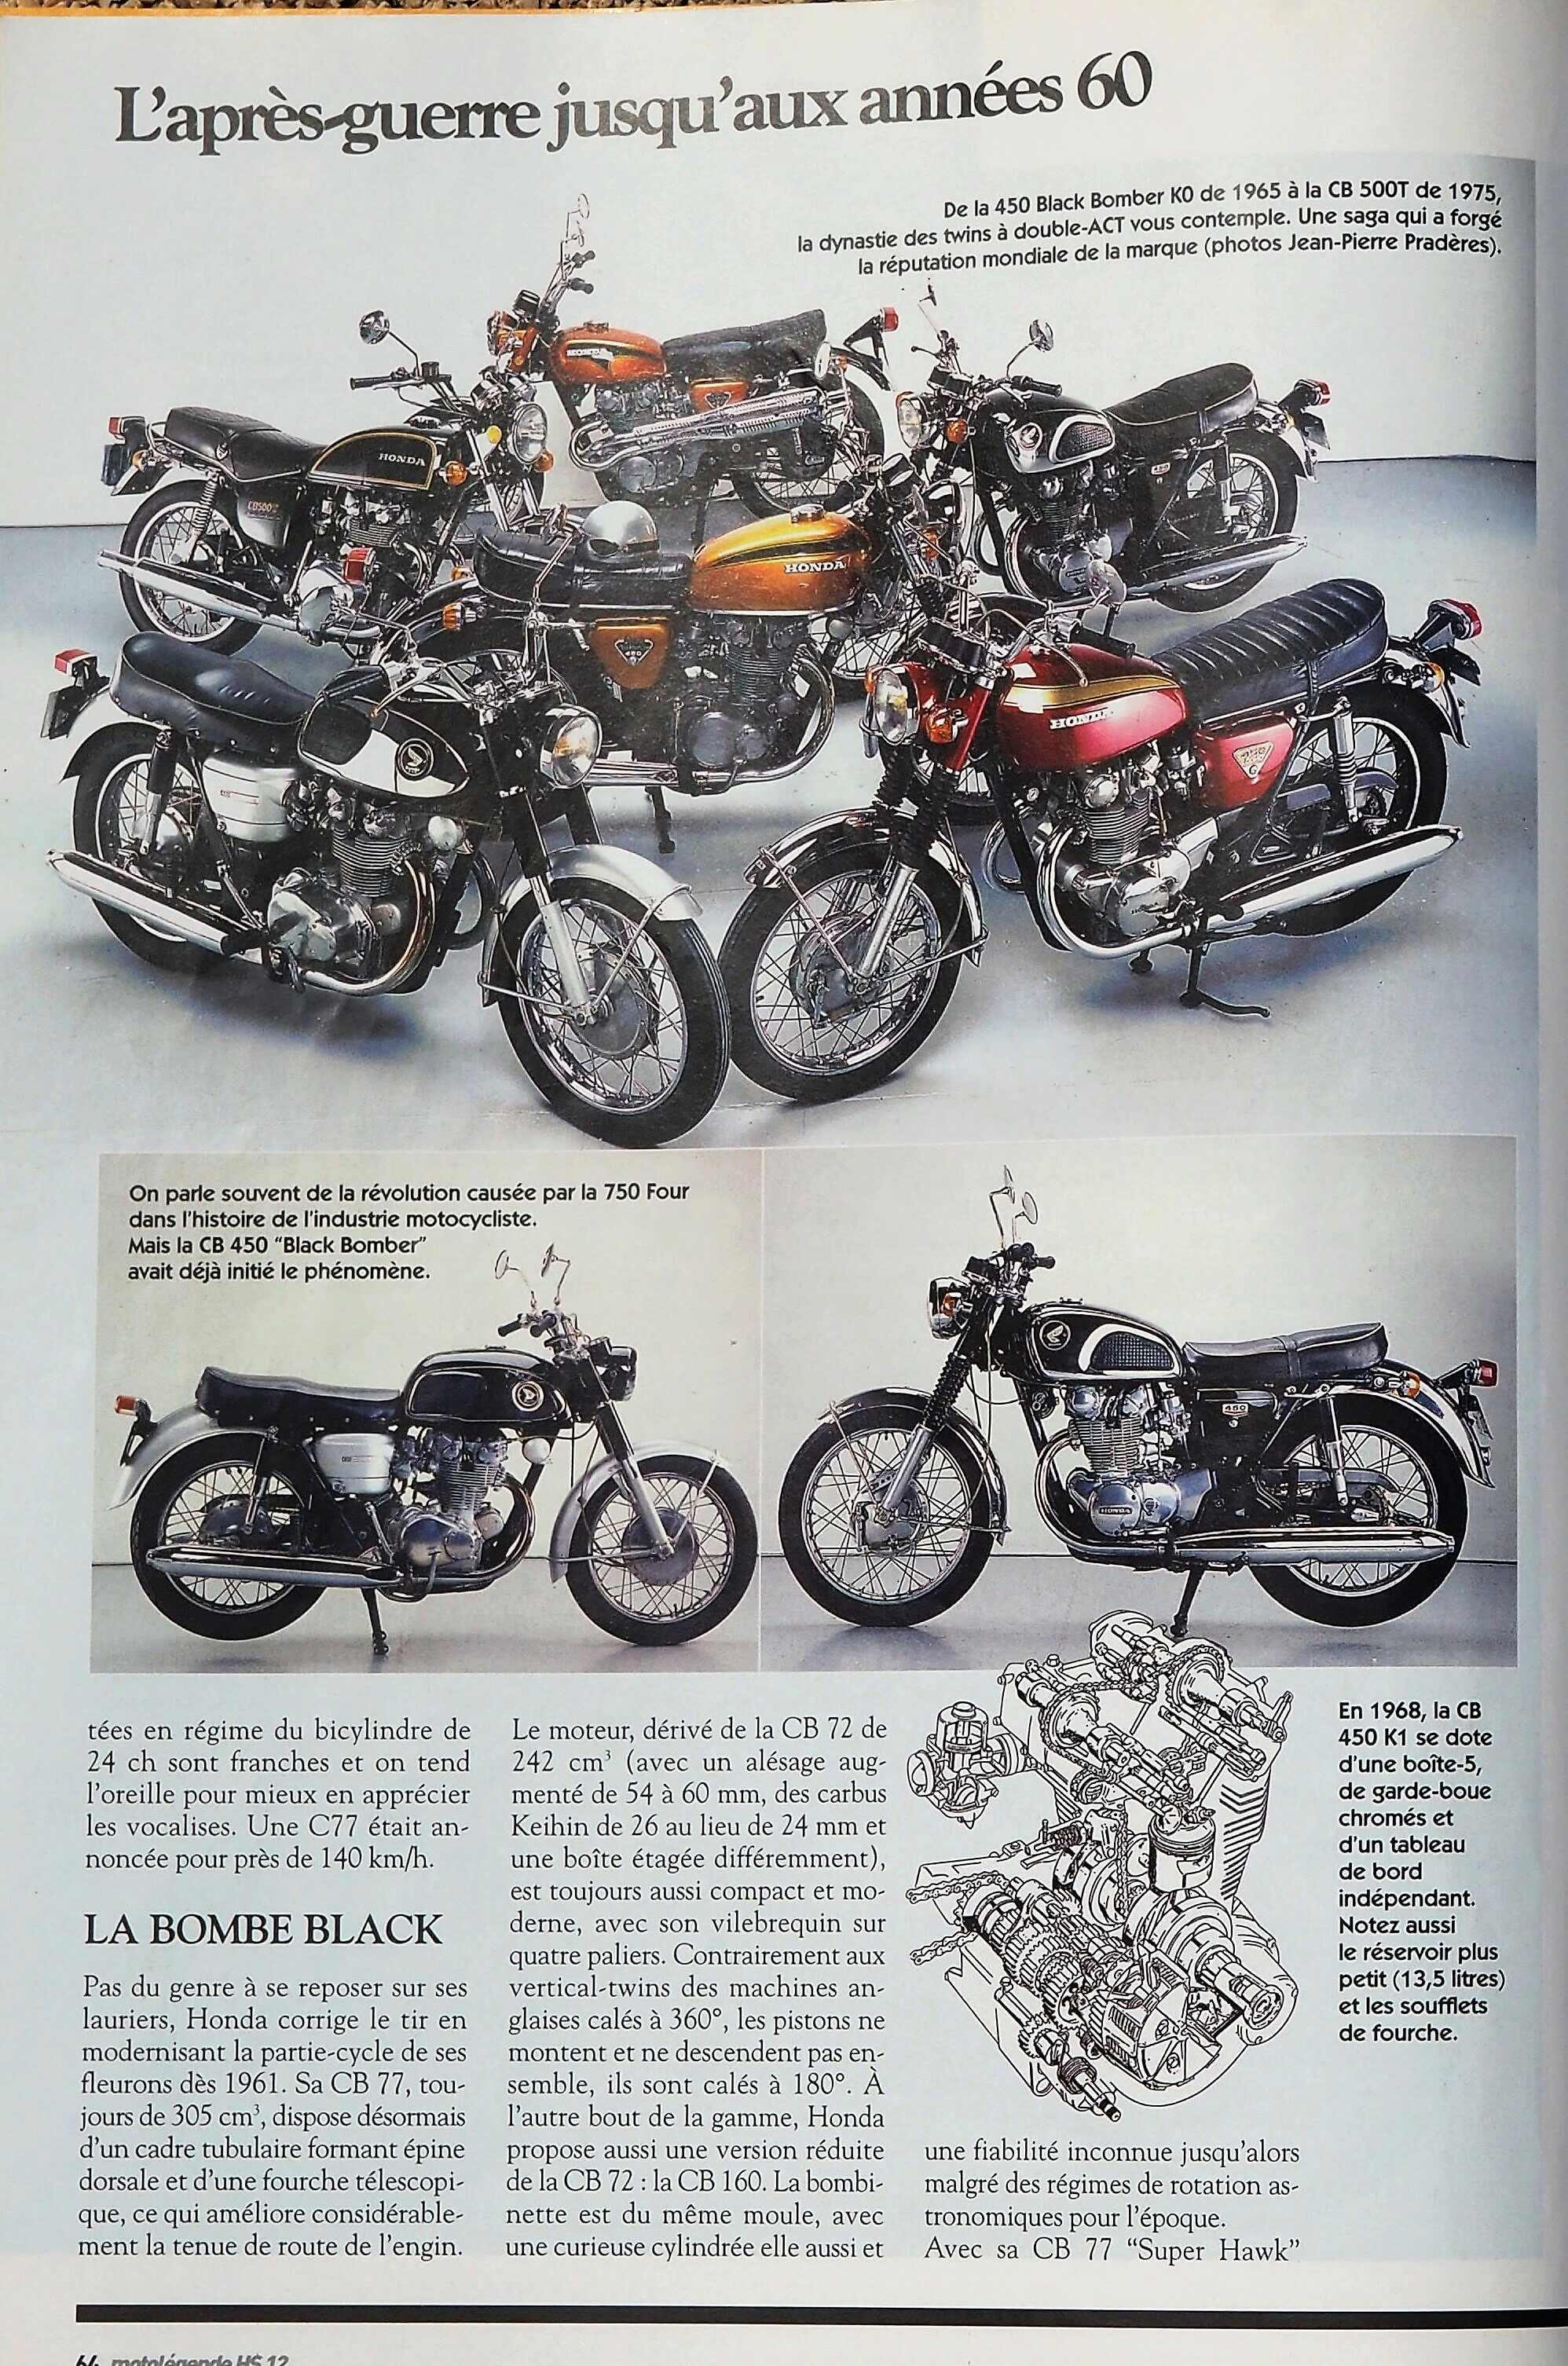 Histoire de la moto. - Page 2 P5091210